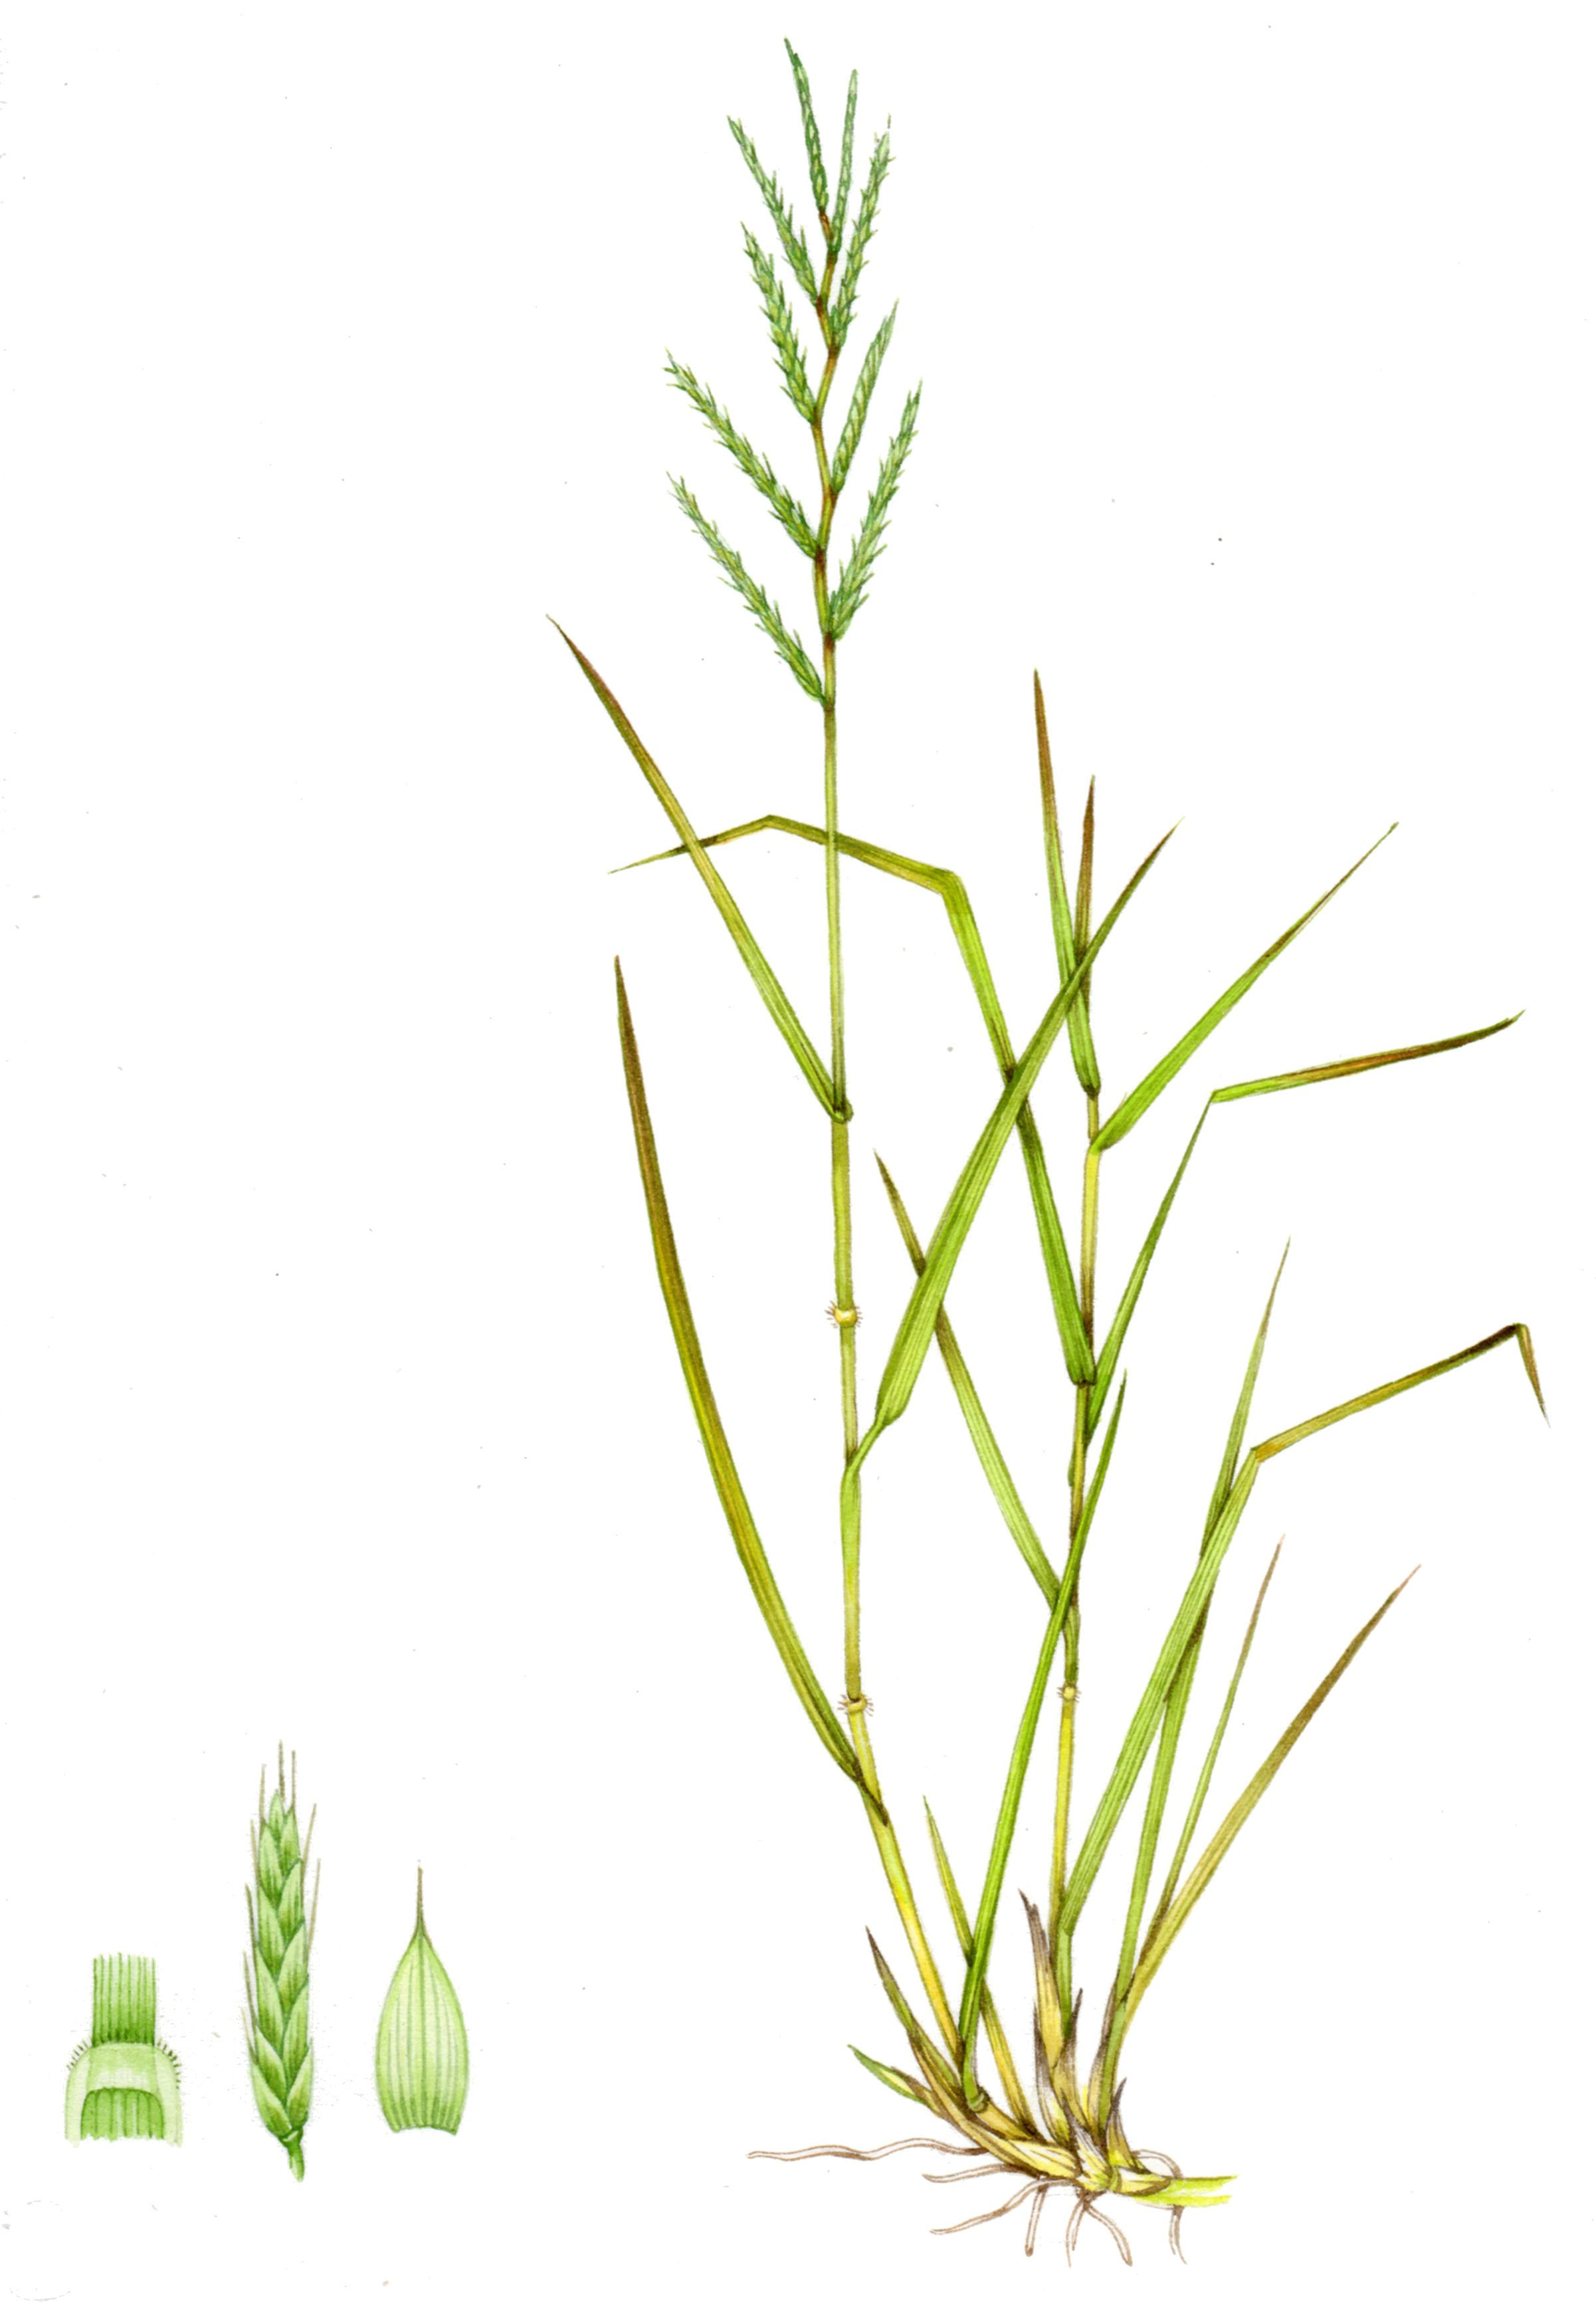 Clipart cheatgrass graphic library Tor grass Brachypodium pinnatum copyright www.lizzieharper.co.uk ... graphic library